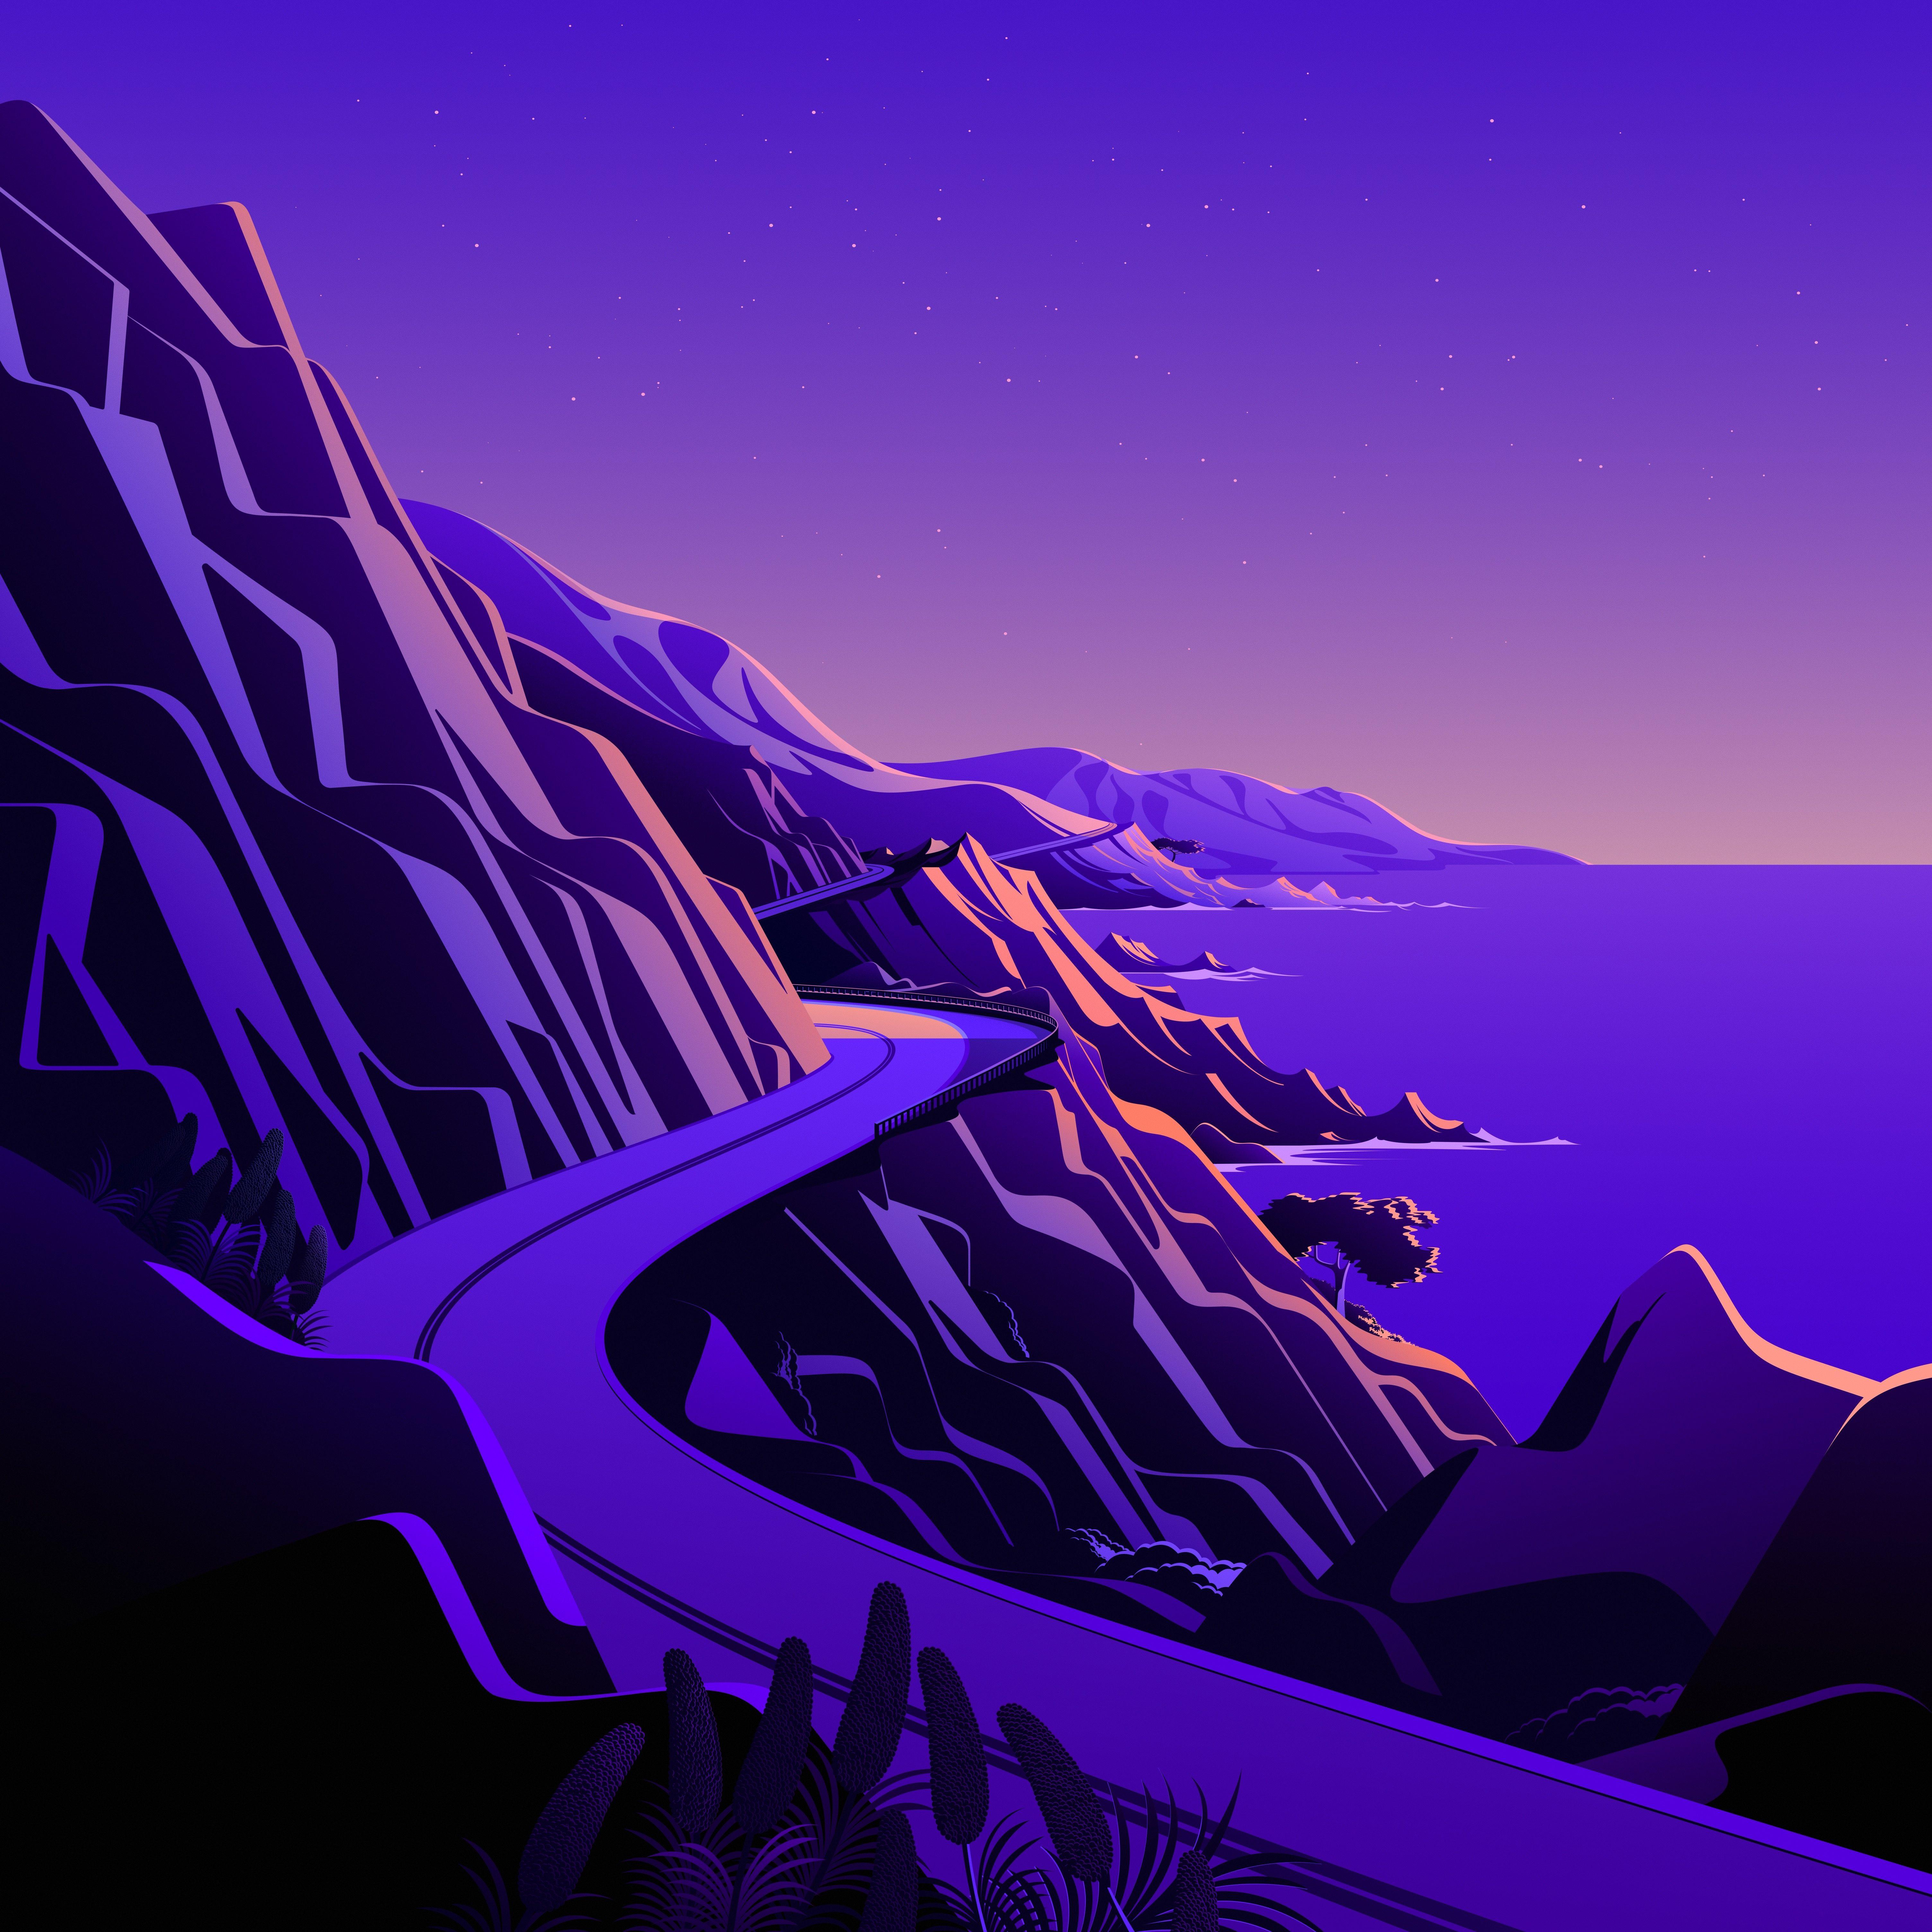 macOS Big Sur The Cliffs 3 dragged